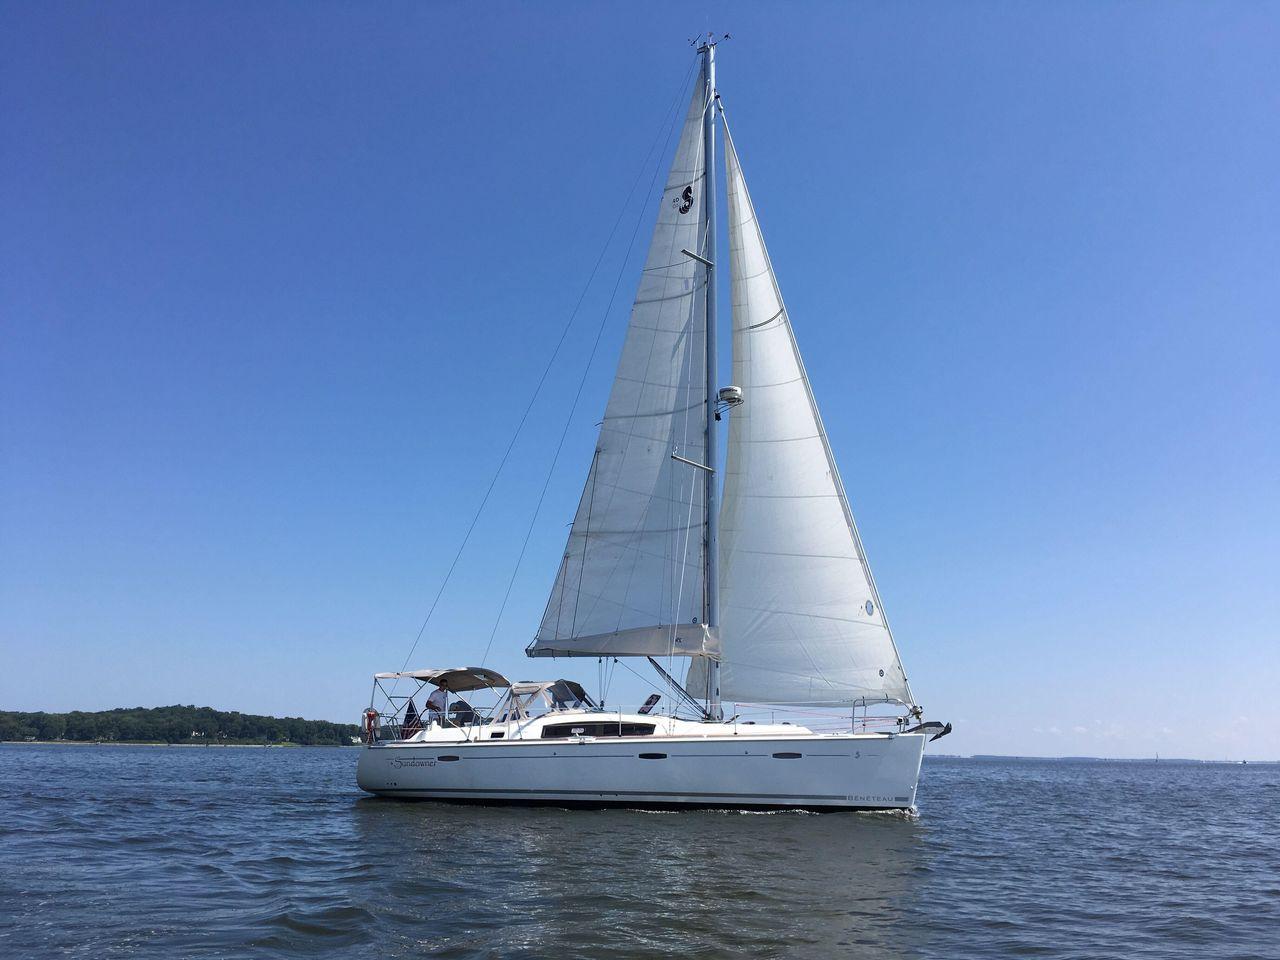 2009 Used Beneteau 40 Cruiser Sailboat For Sale - $139,000